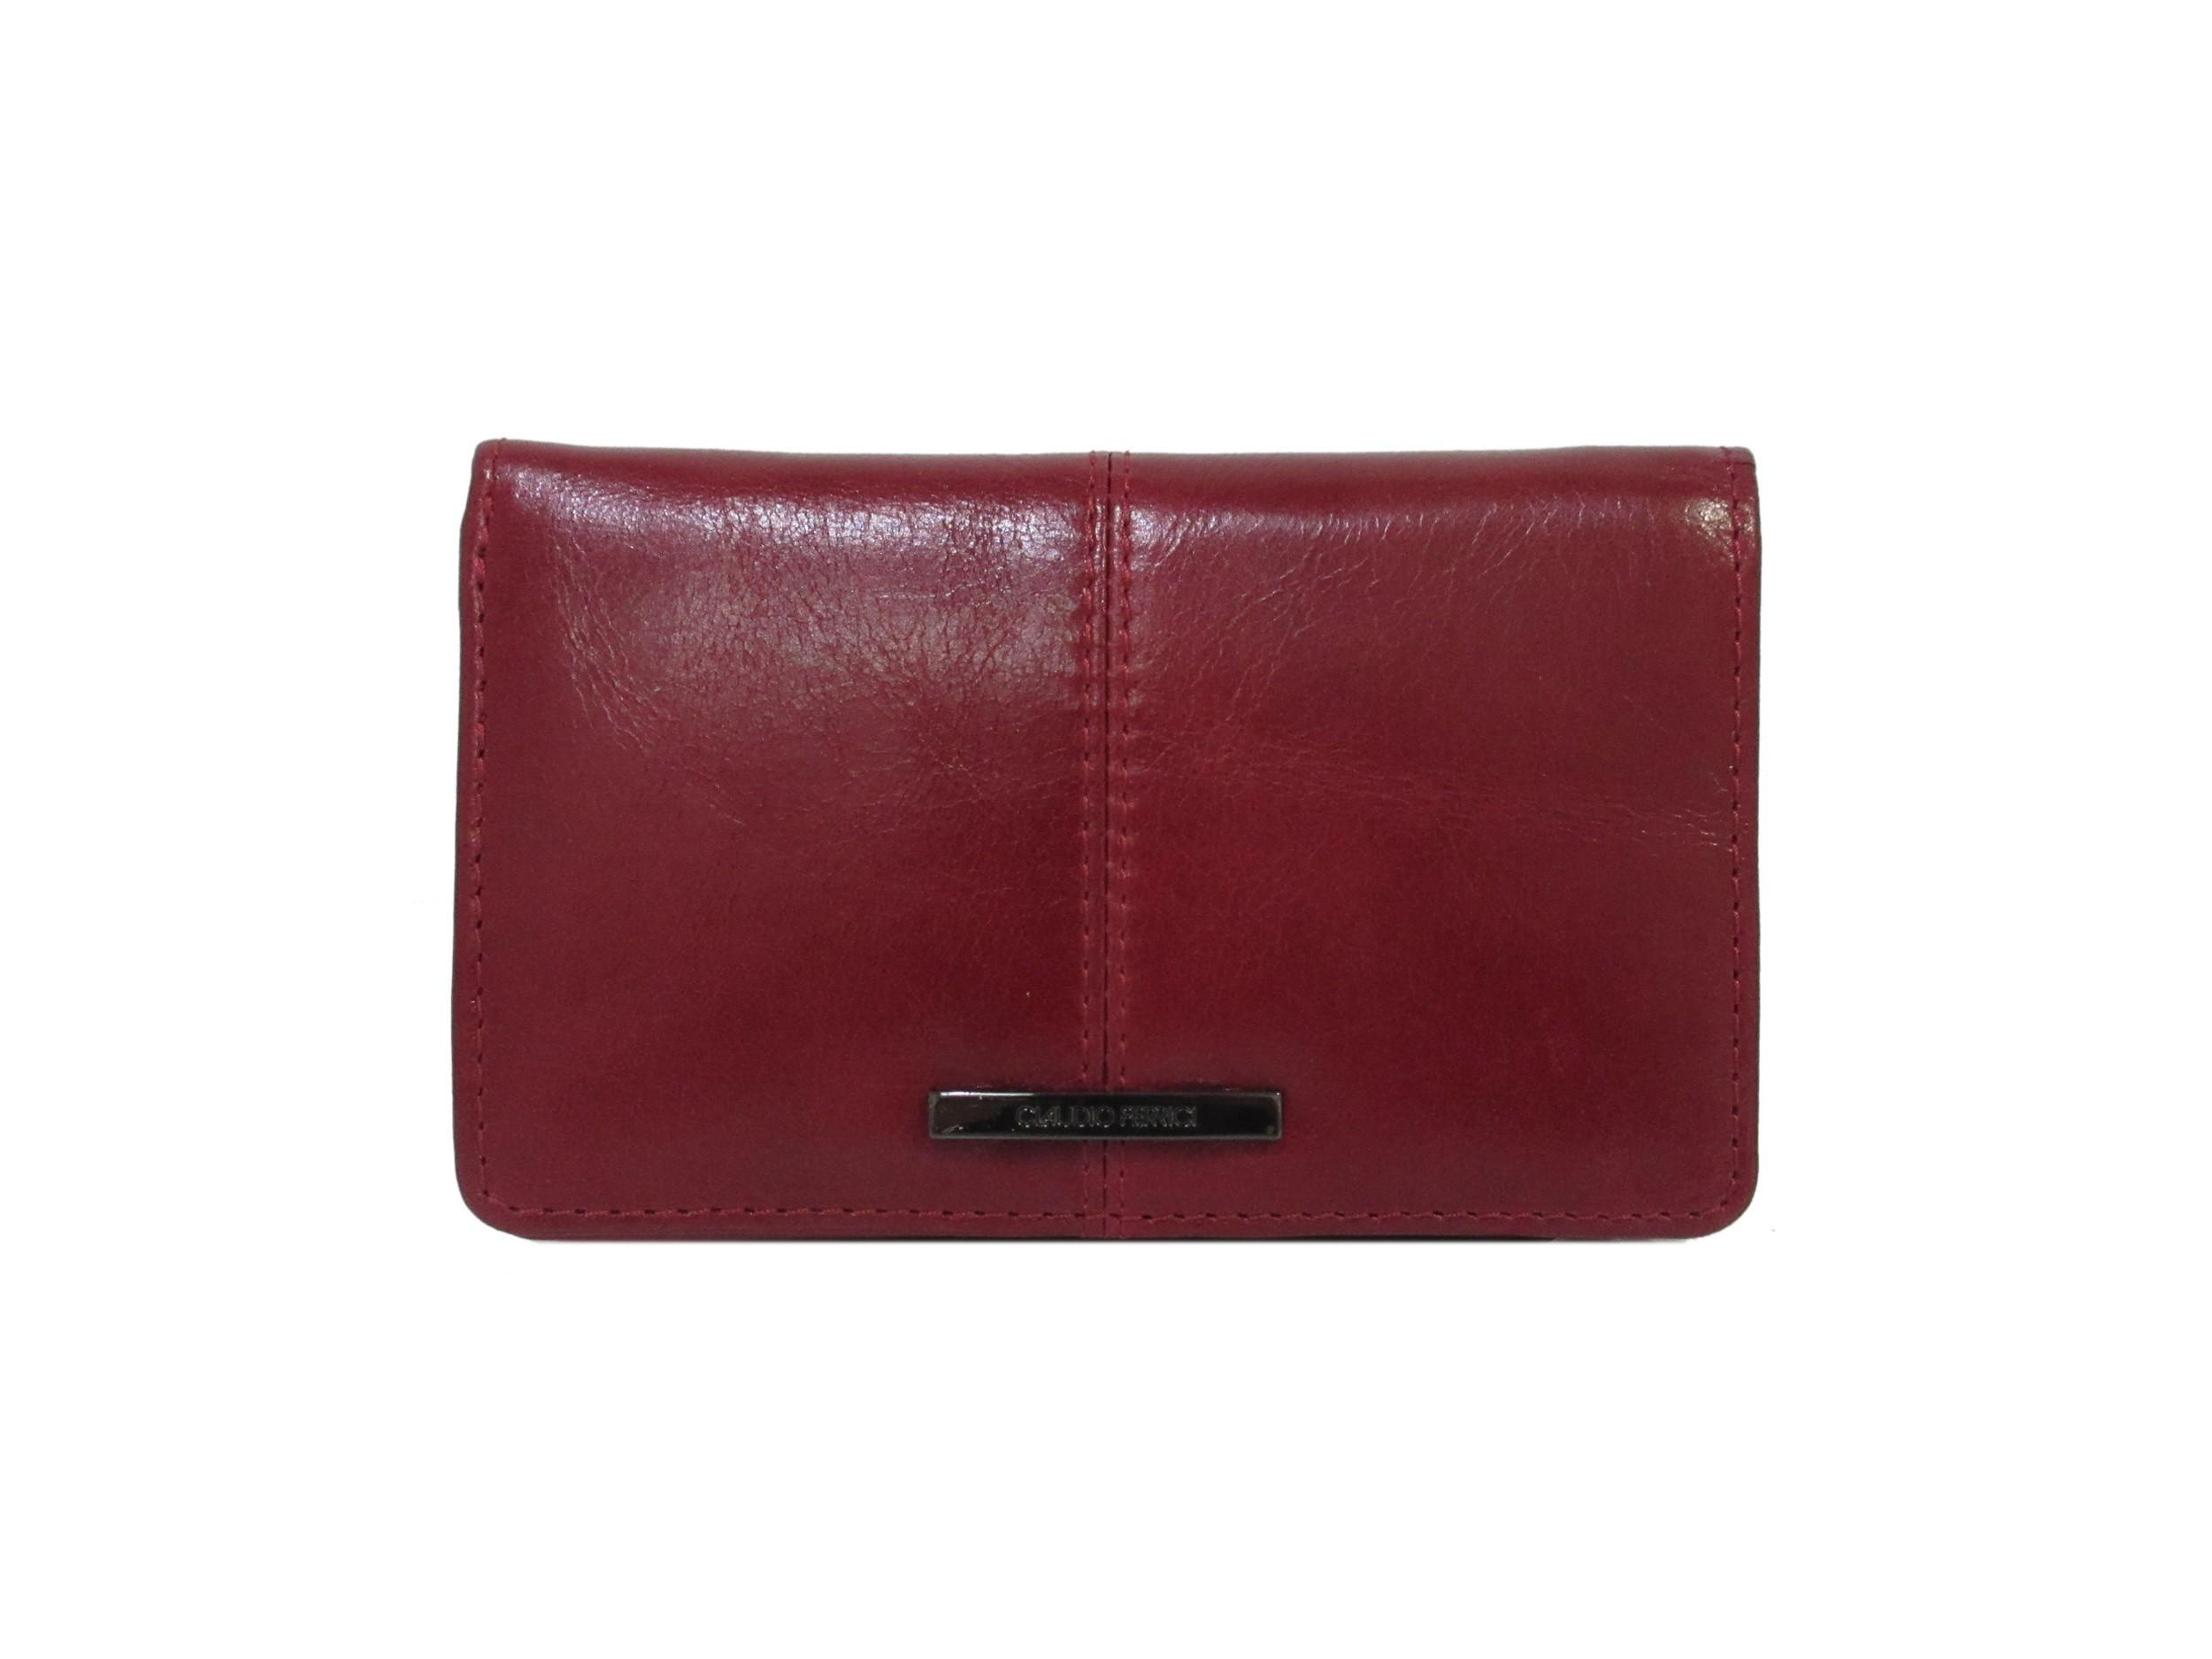 Claudio Ferrici Pelle Vecchia Wallet 22902 Red